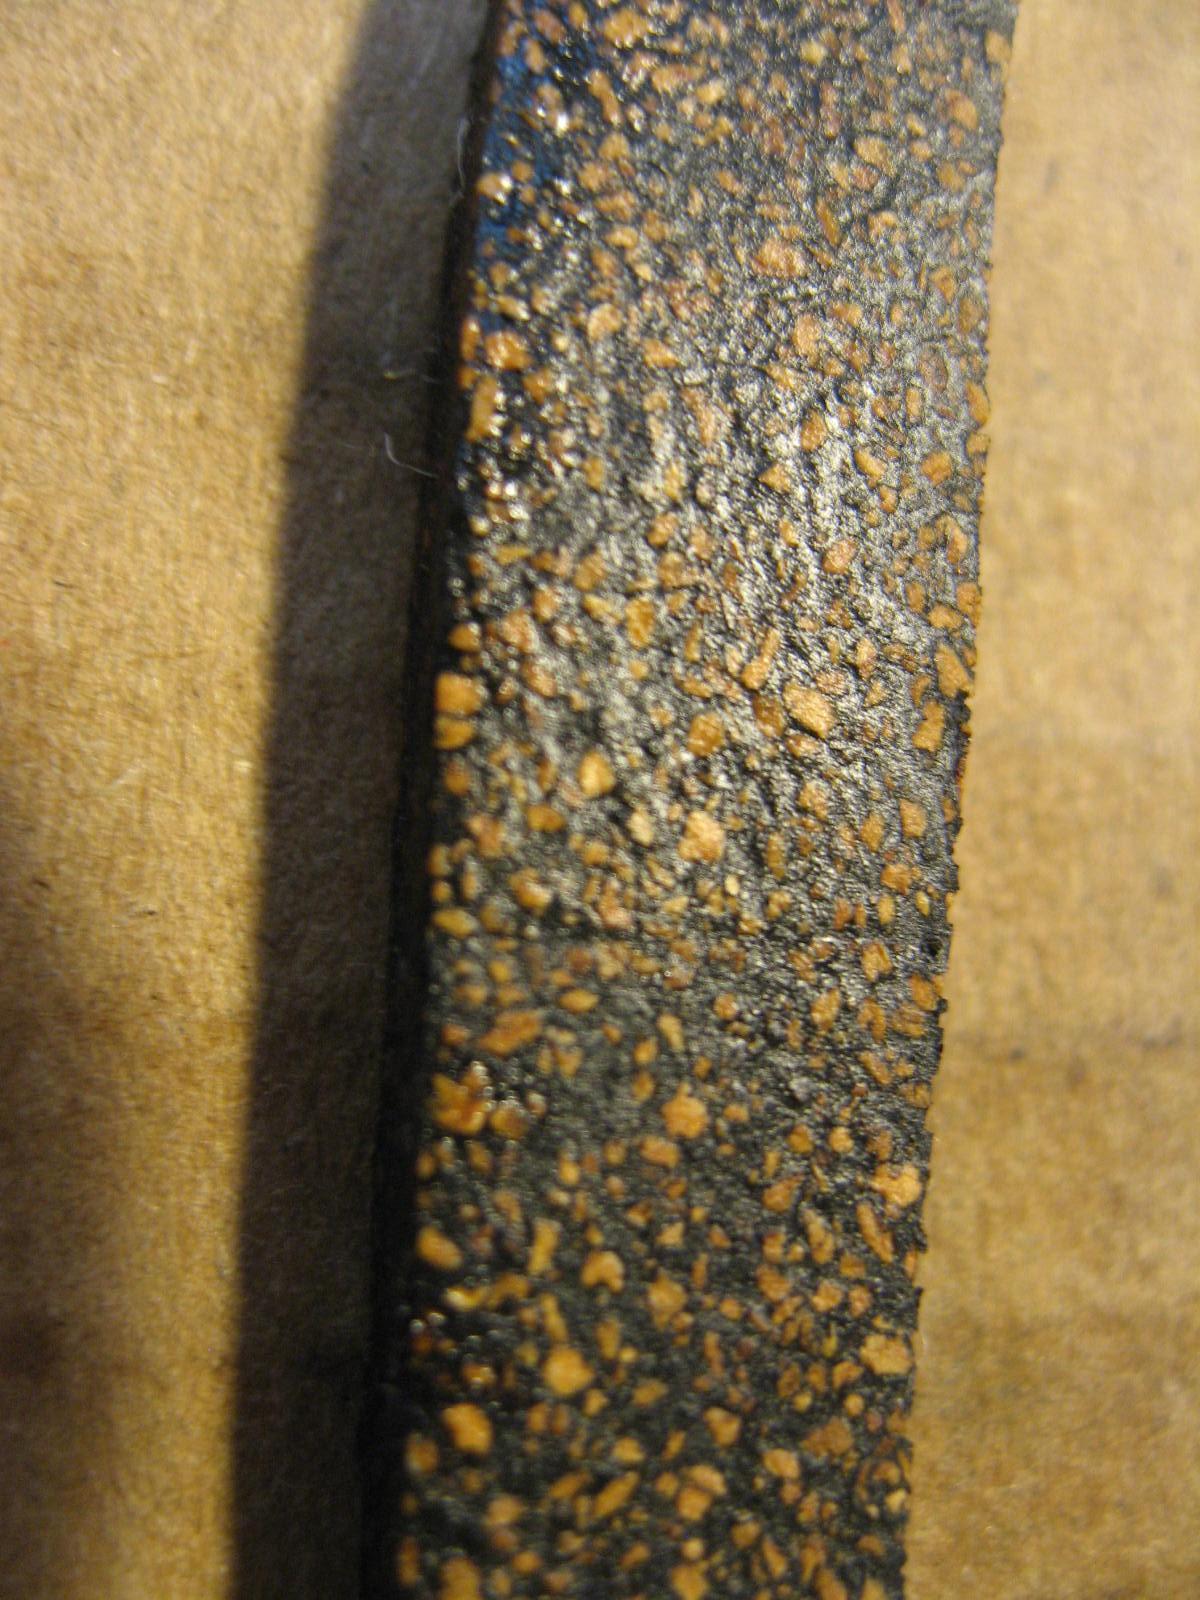 valve cover gasket leak flaw